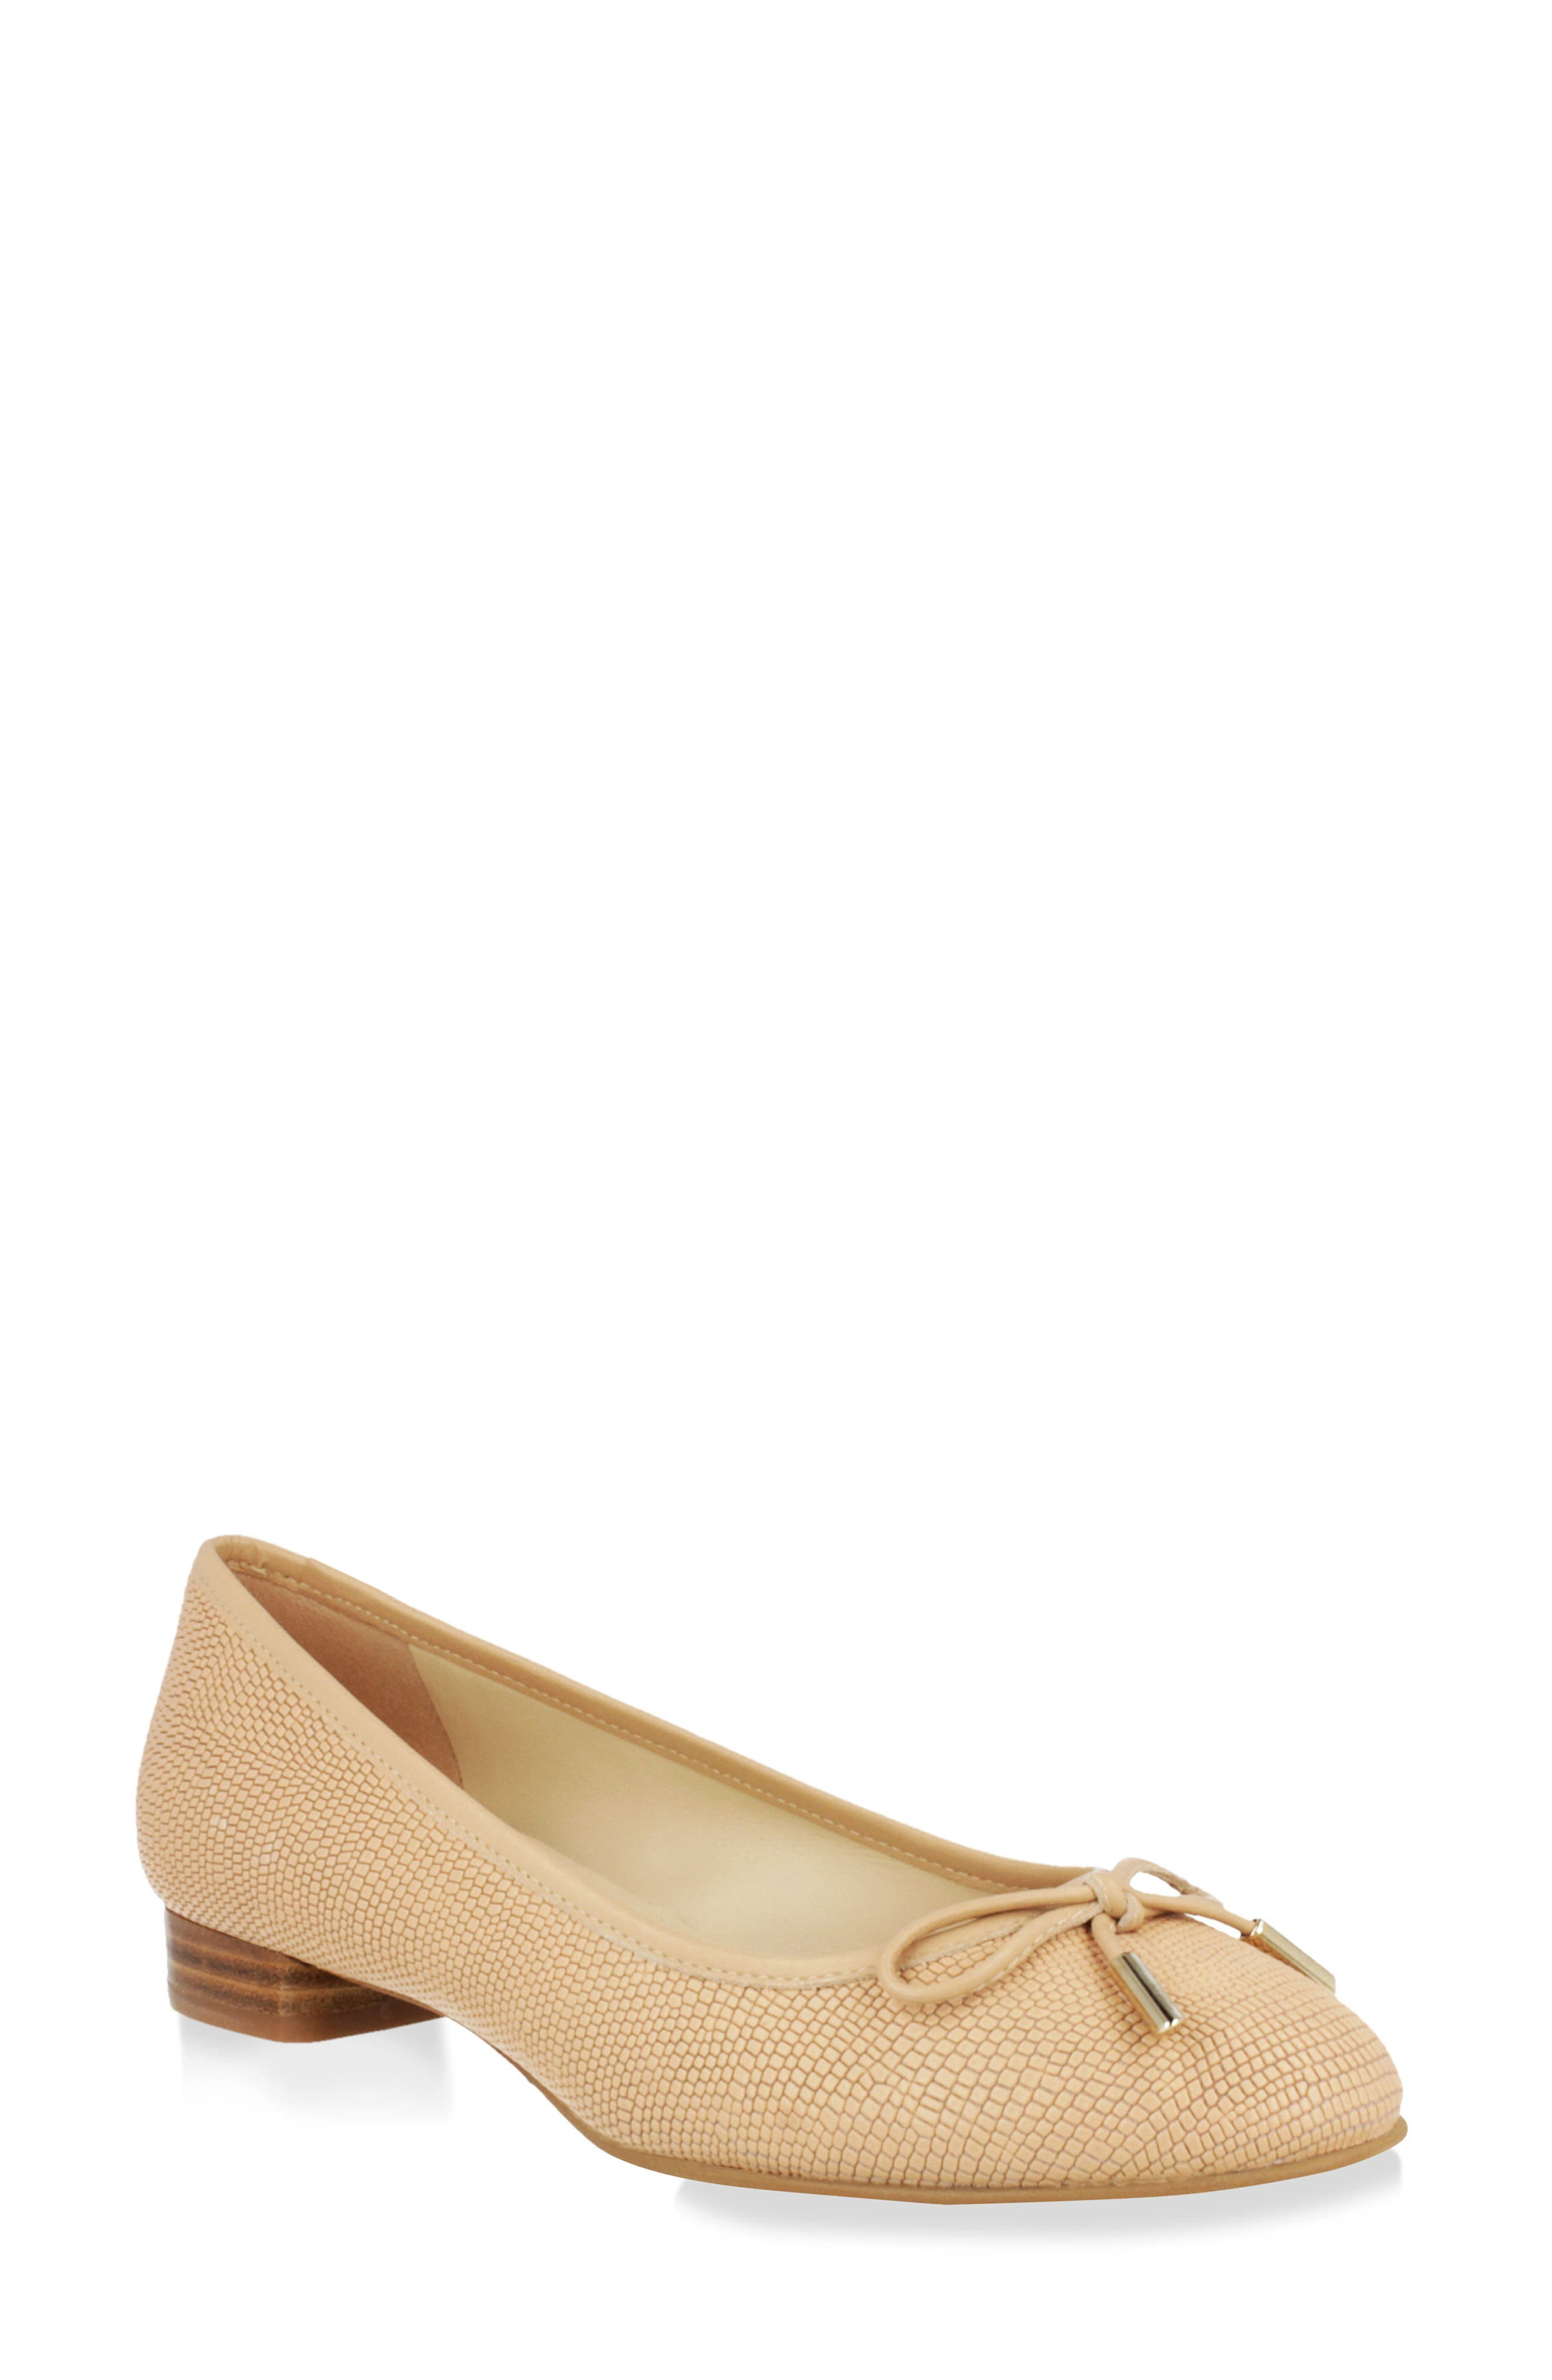 Lara Ballet Flat,                         Main,                         color, Natural Leather